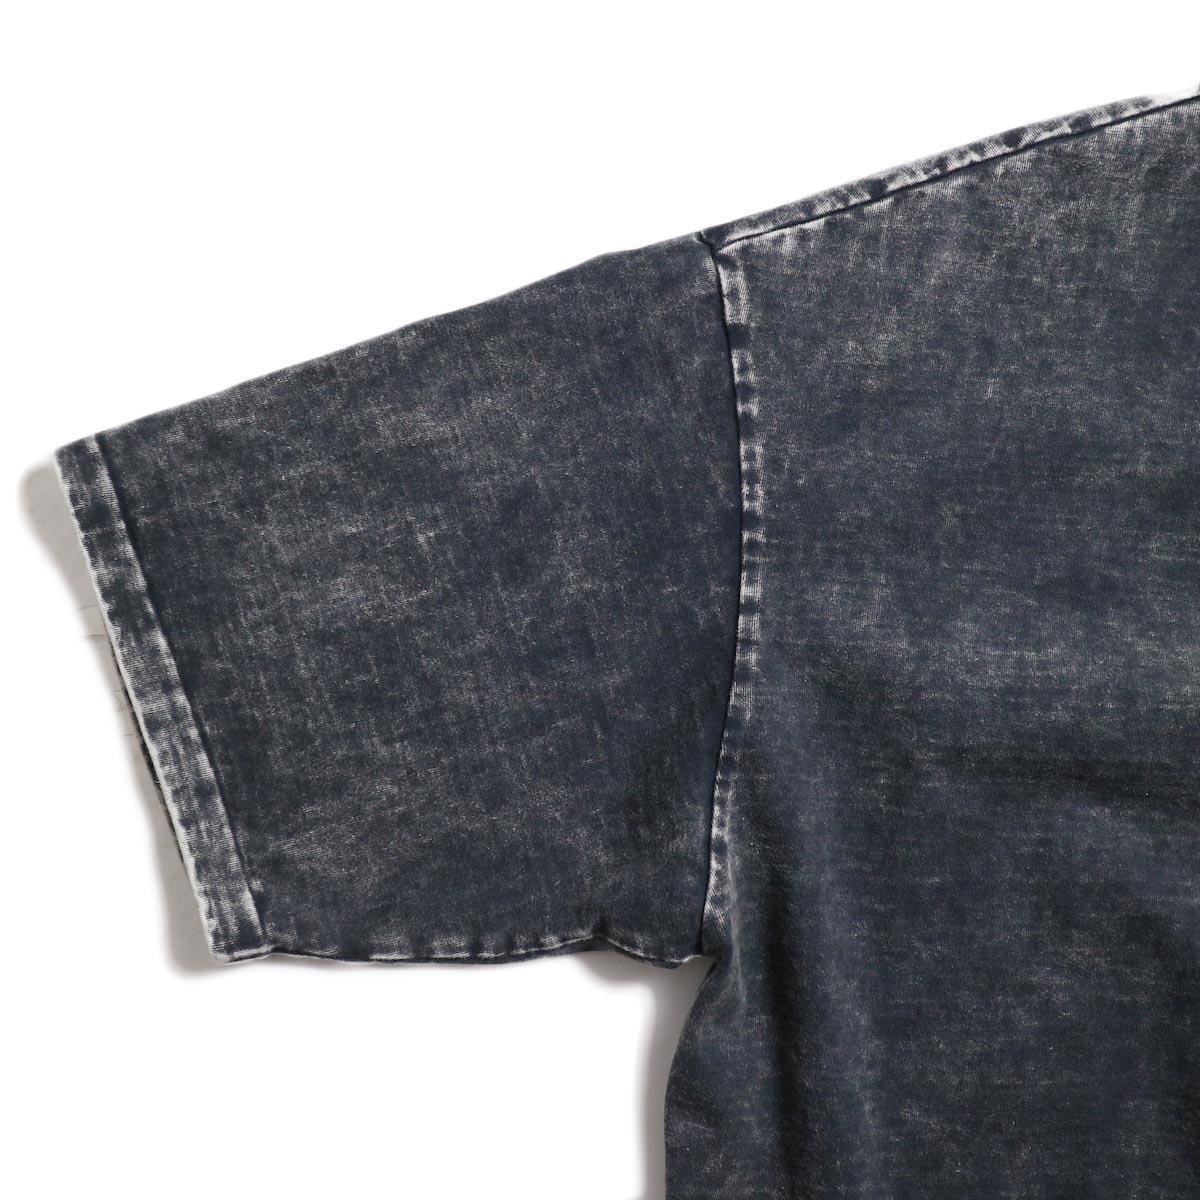 N.HOOLYWOOD × Gramicci  / 191-CS27-024 Short Sleeve Tee -Black 袖